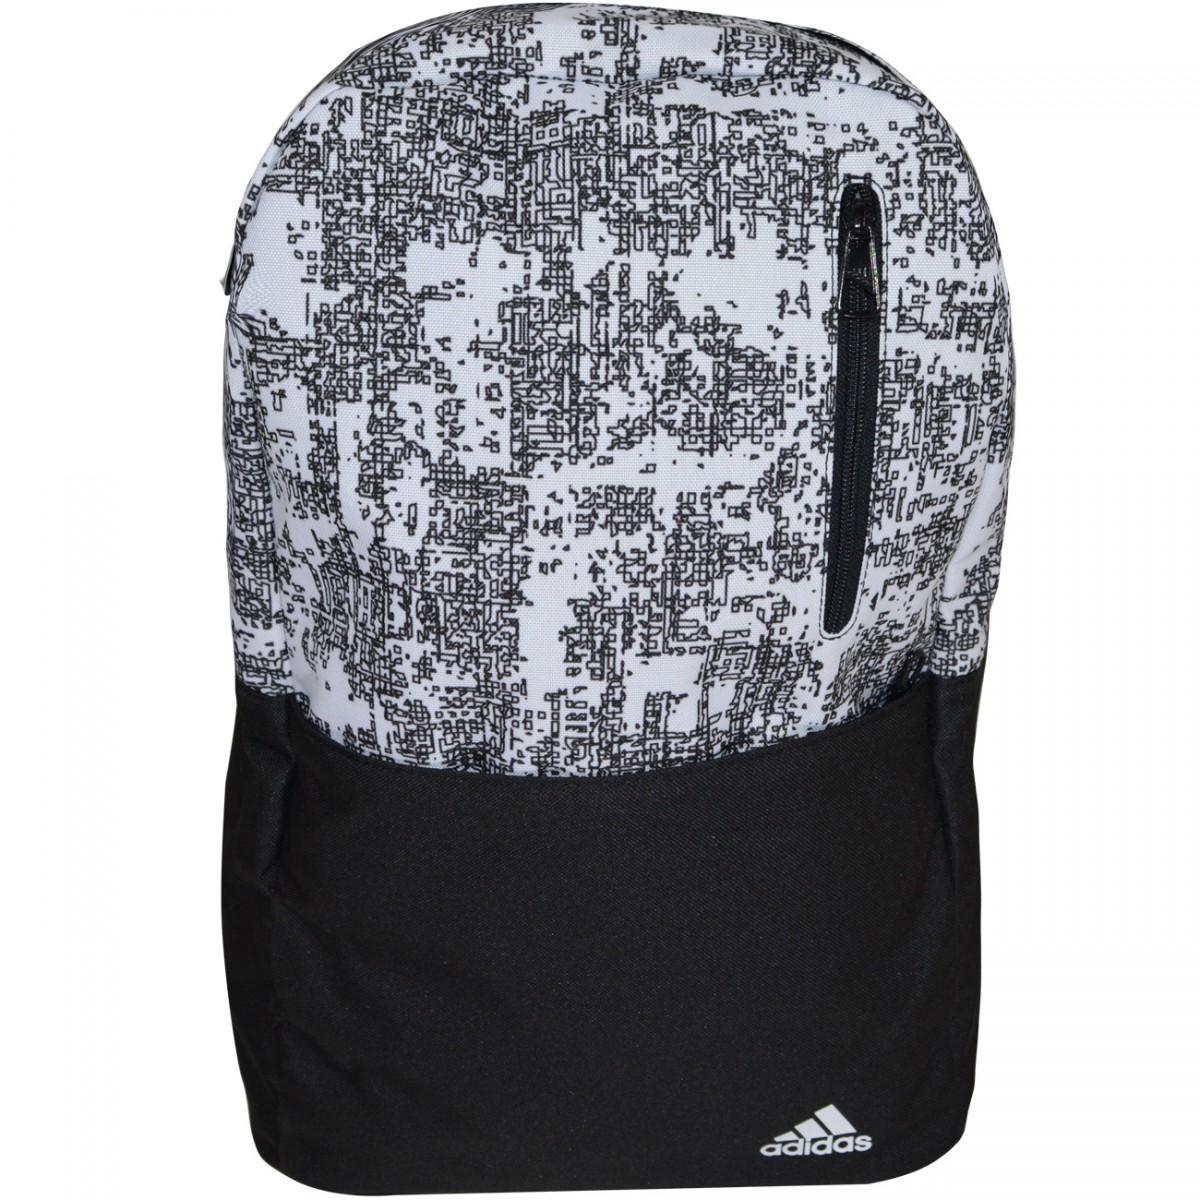 6ffe2874a Mochila Adidas Versatile BP G1 AY5130 - Preto/Branco - Chuteira Nike, Adidas.  Sandalias Femininas. Sandy Calçados